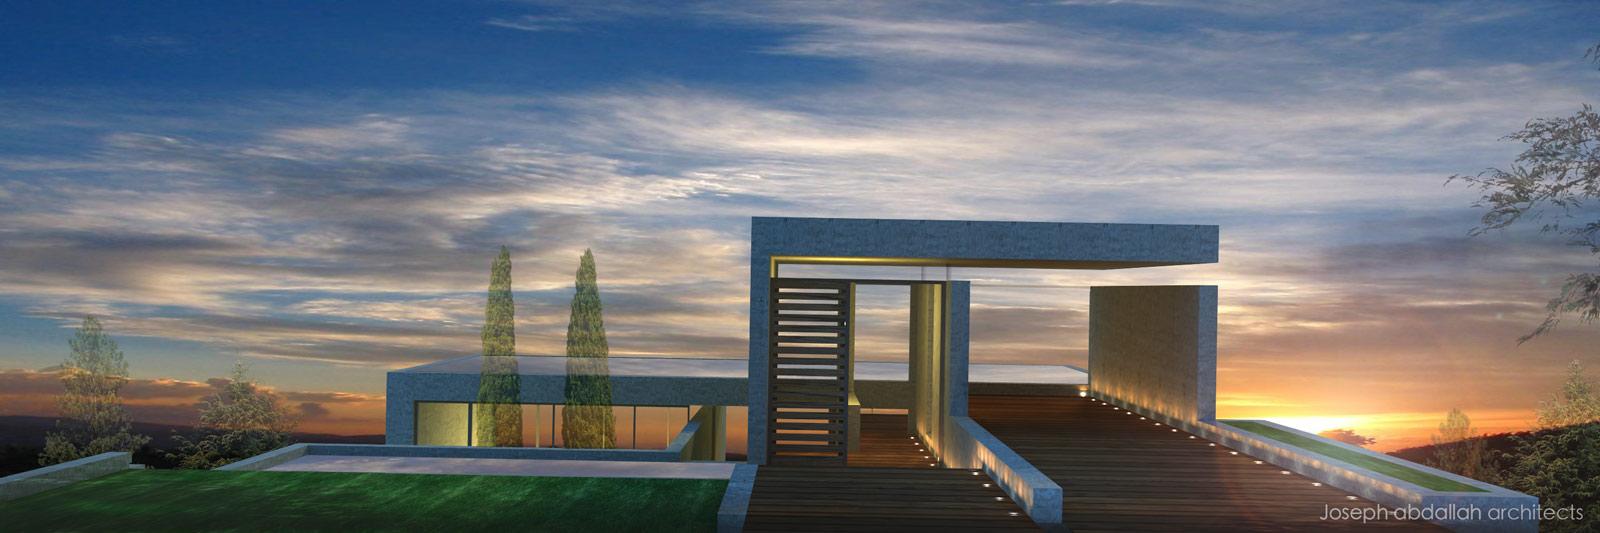 n-chalet-water-mirror-villa-fakra-lebanon-joseph-abdallah-architects-1